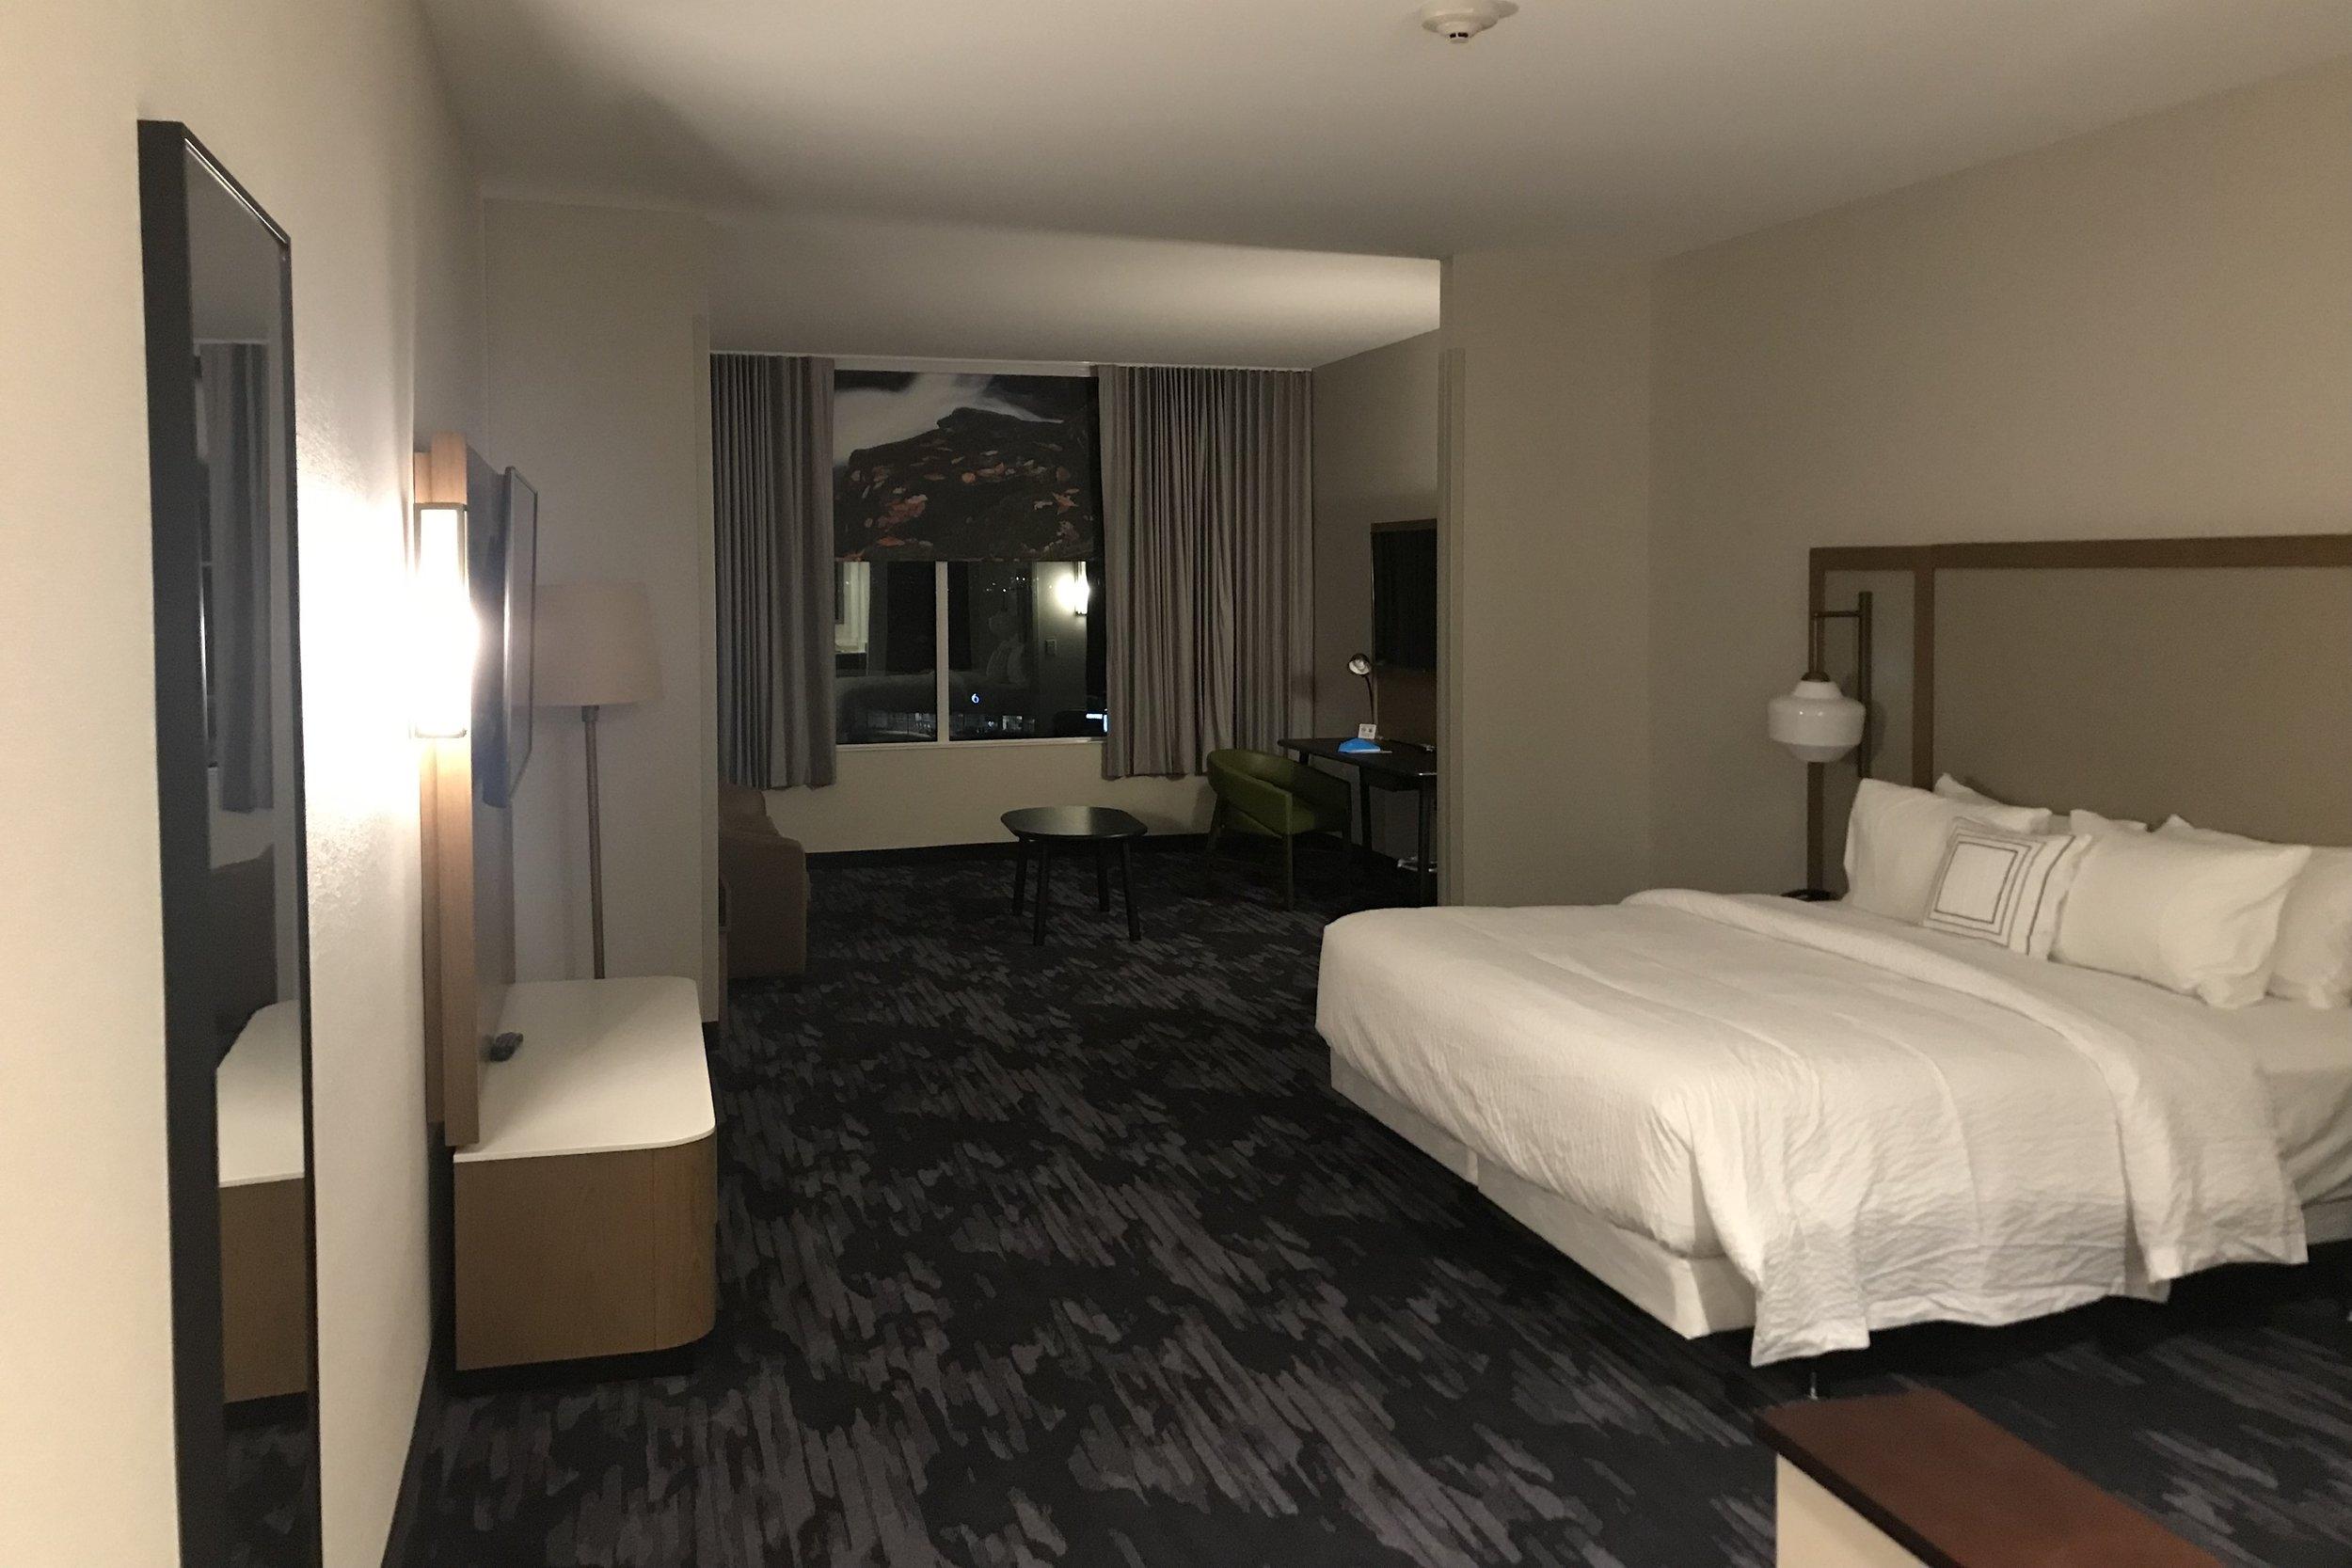 Fairfield Inn & Suites Ottawa Airport